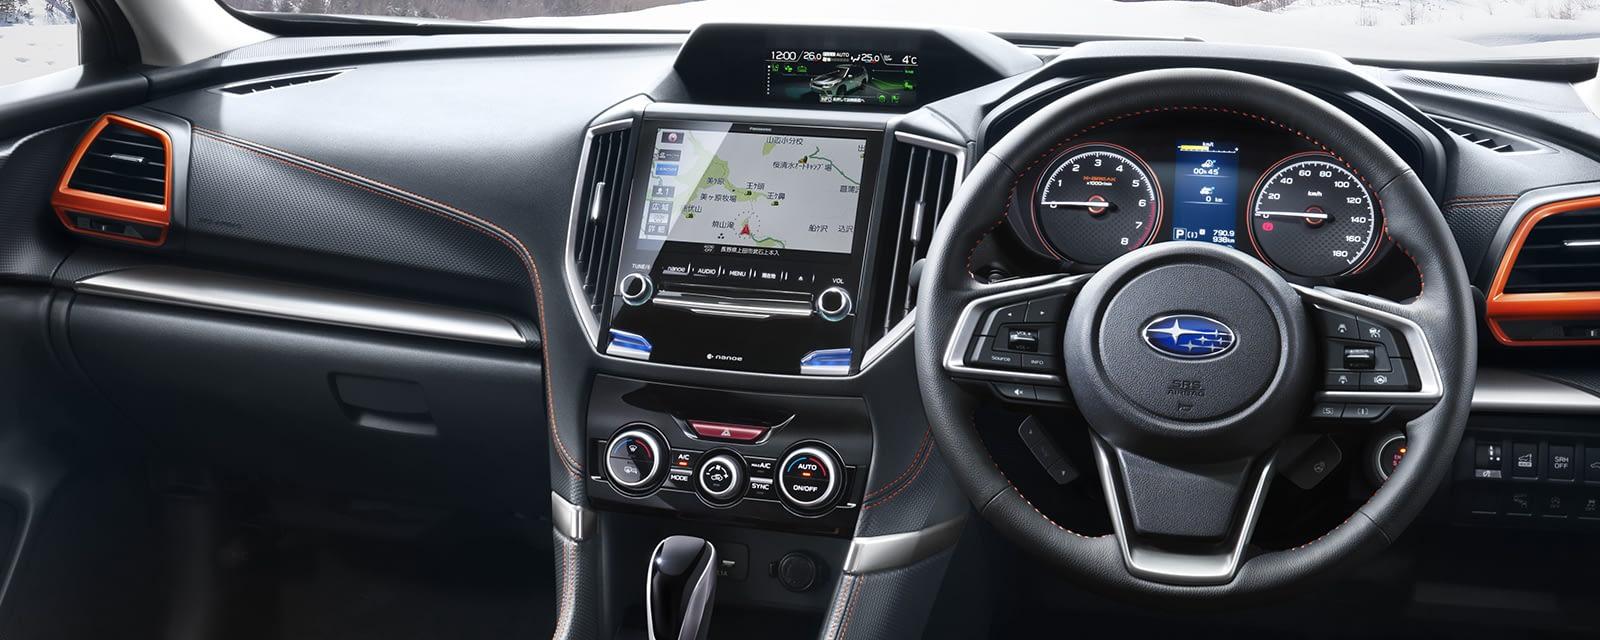 2019 Subaru forester vs outback interior